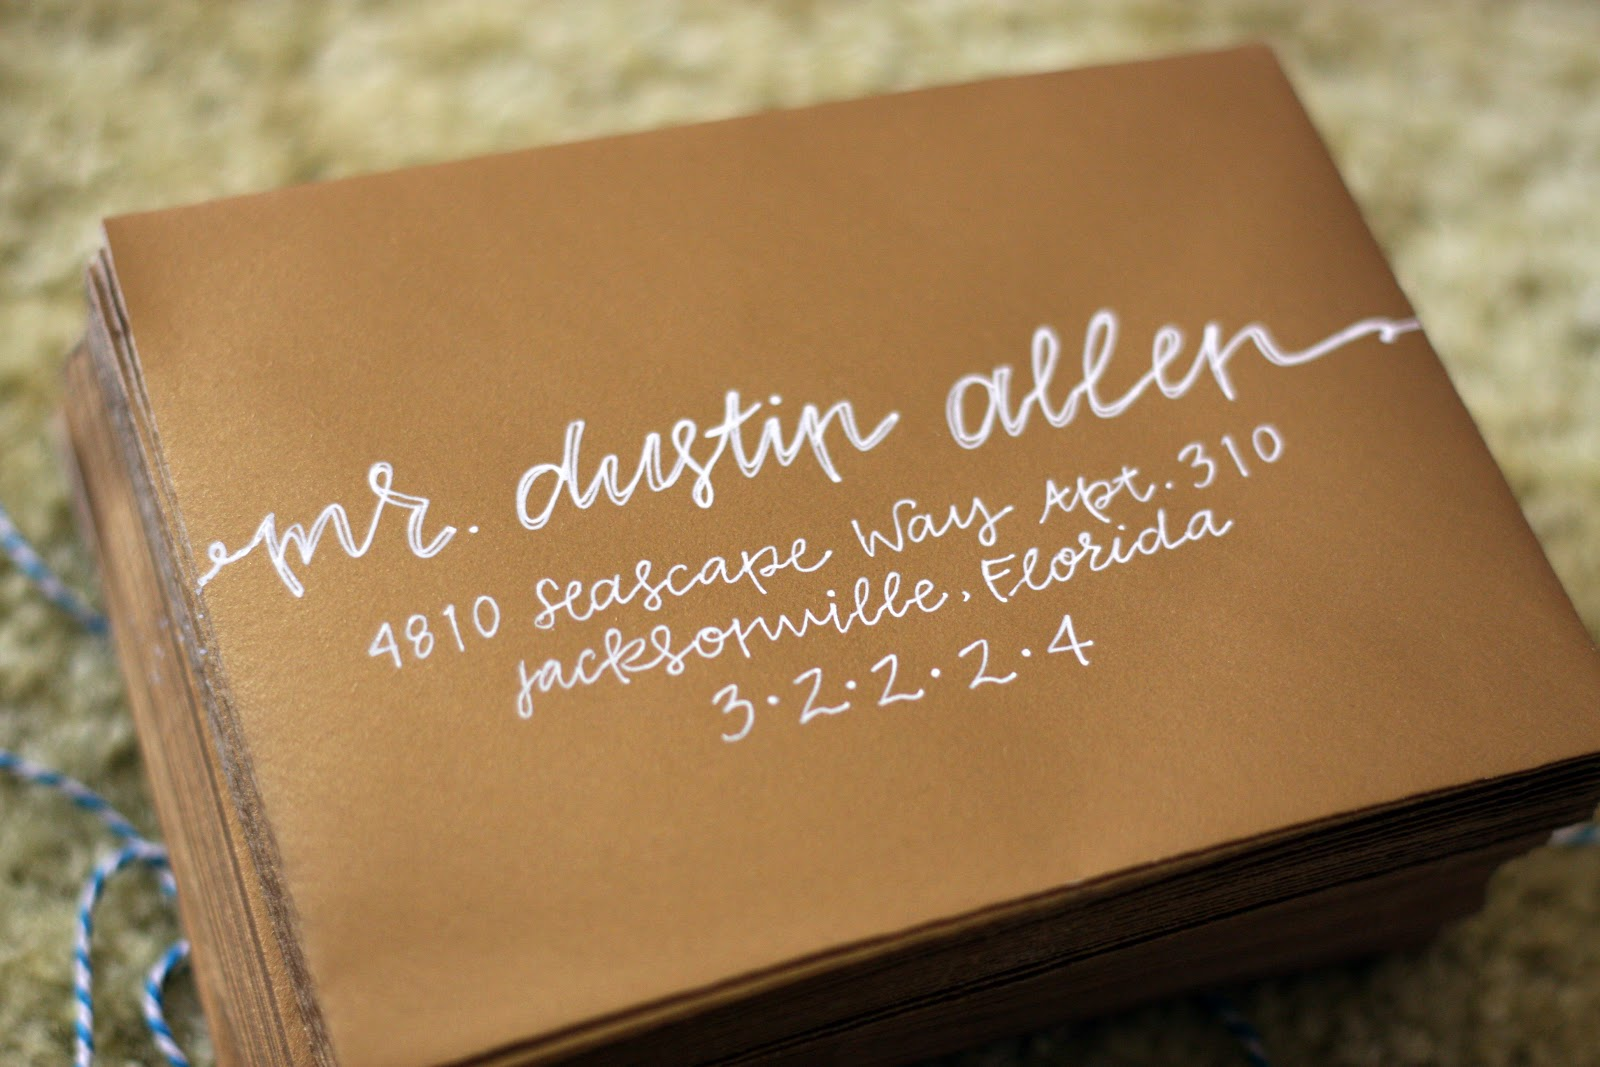 How to address wedding invitation envelopes | ann's bridal bargains.